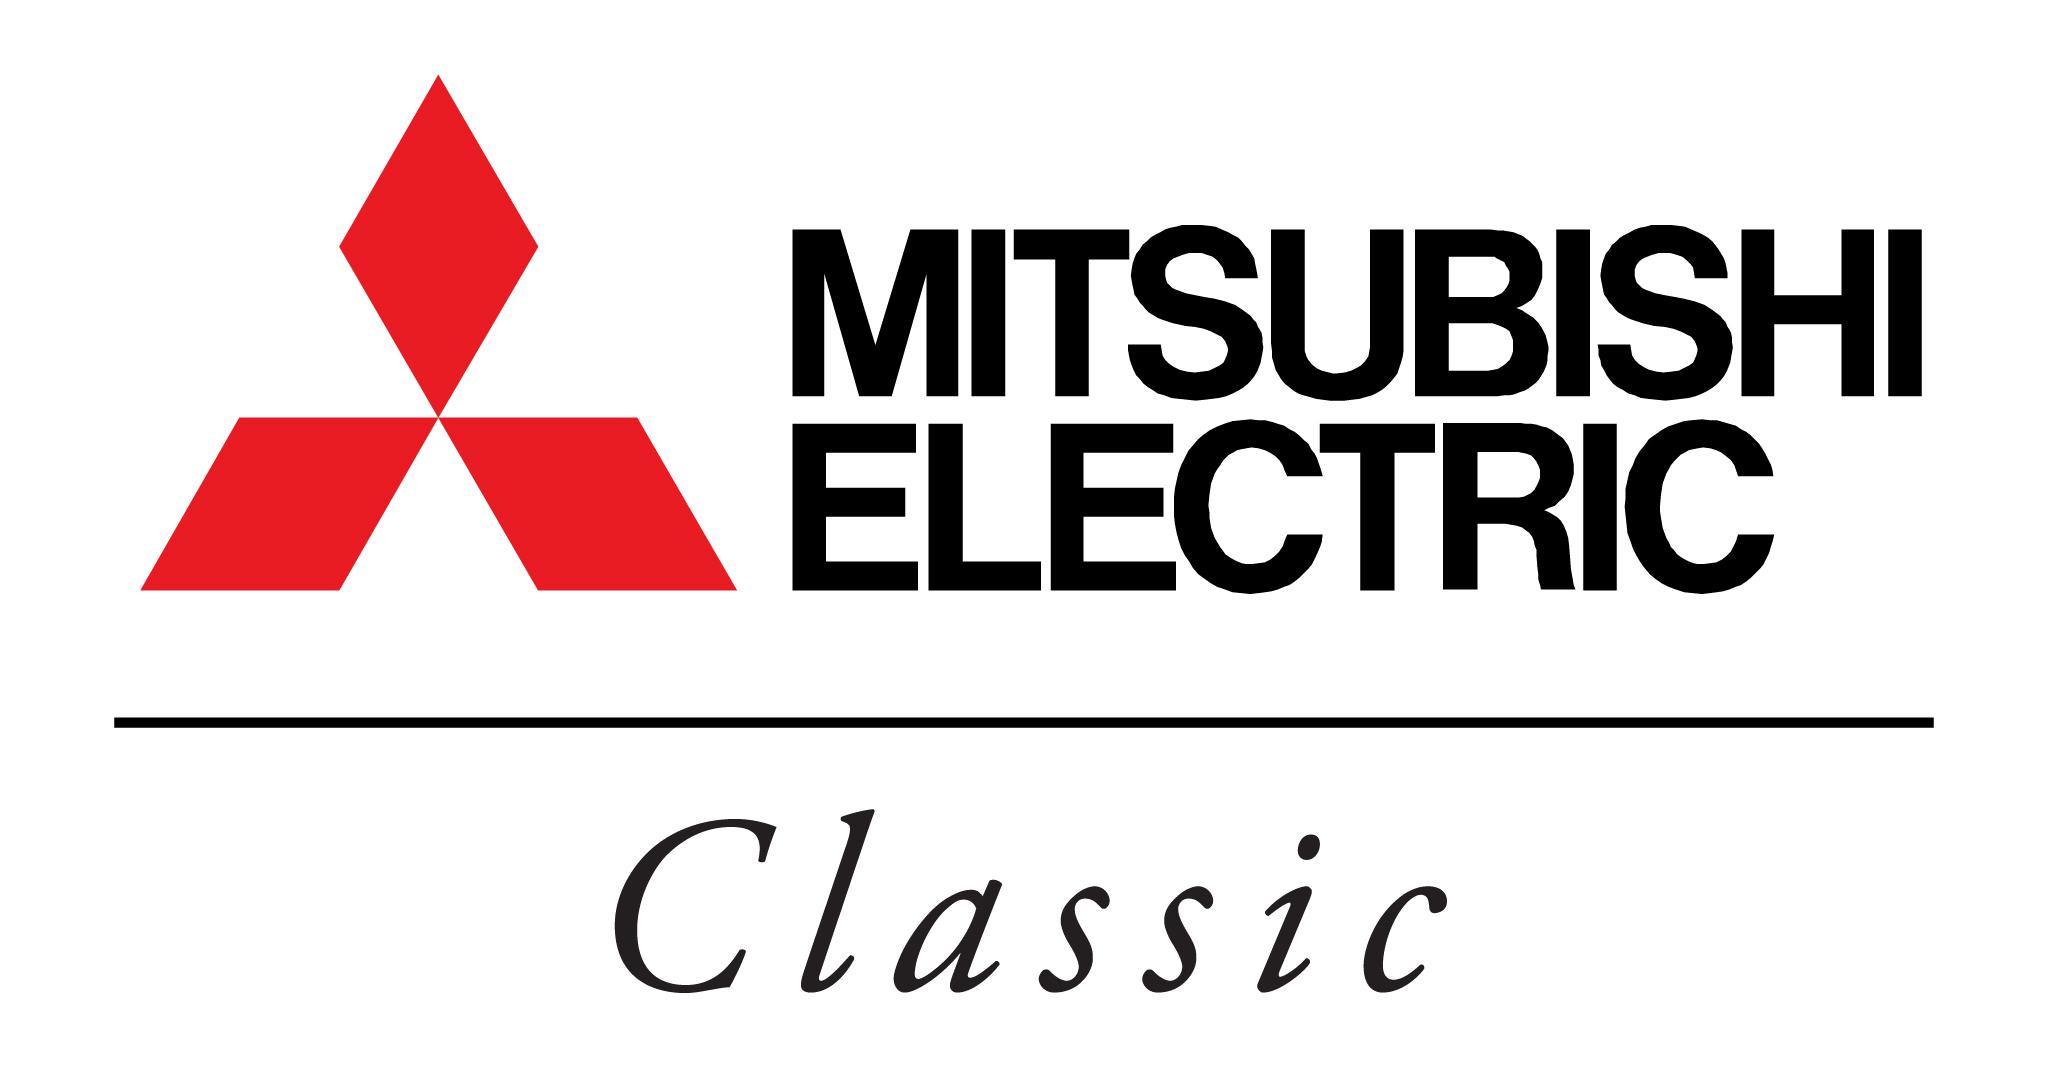 Mitsubishi Electric Classic